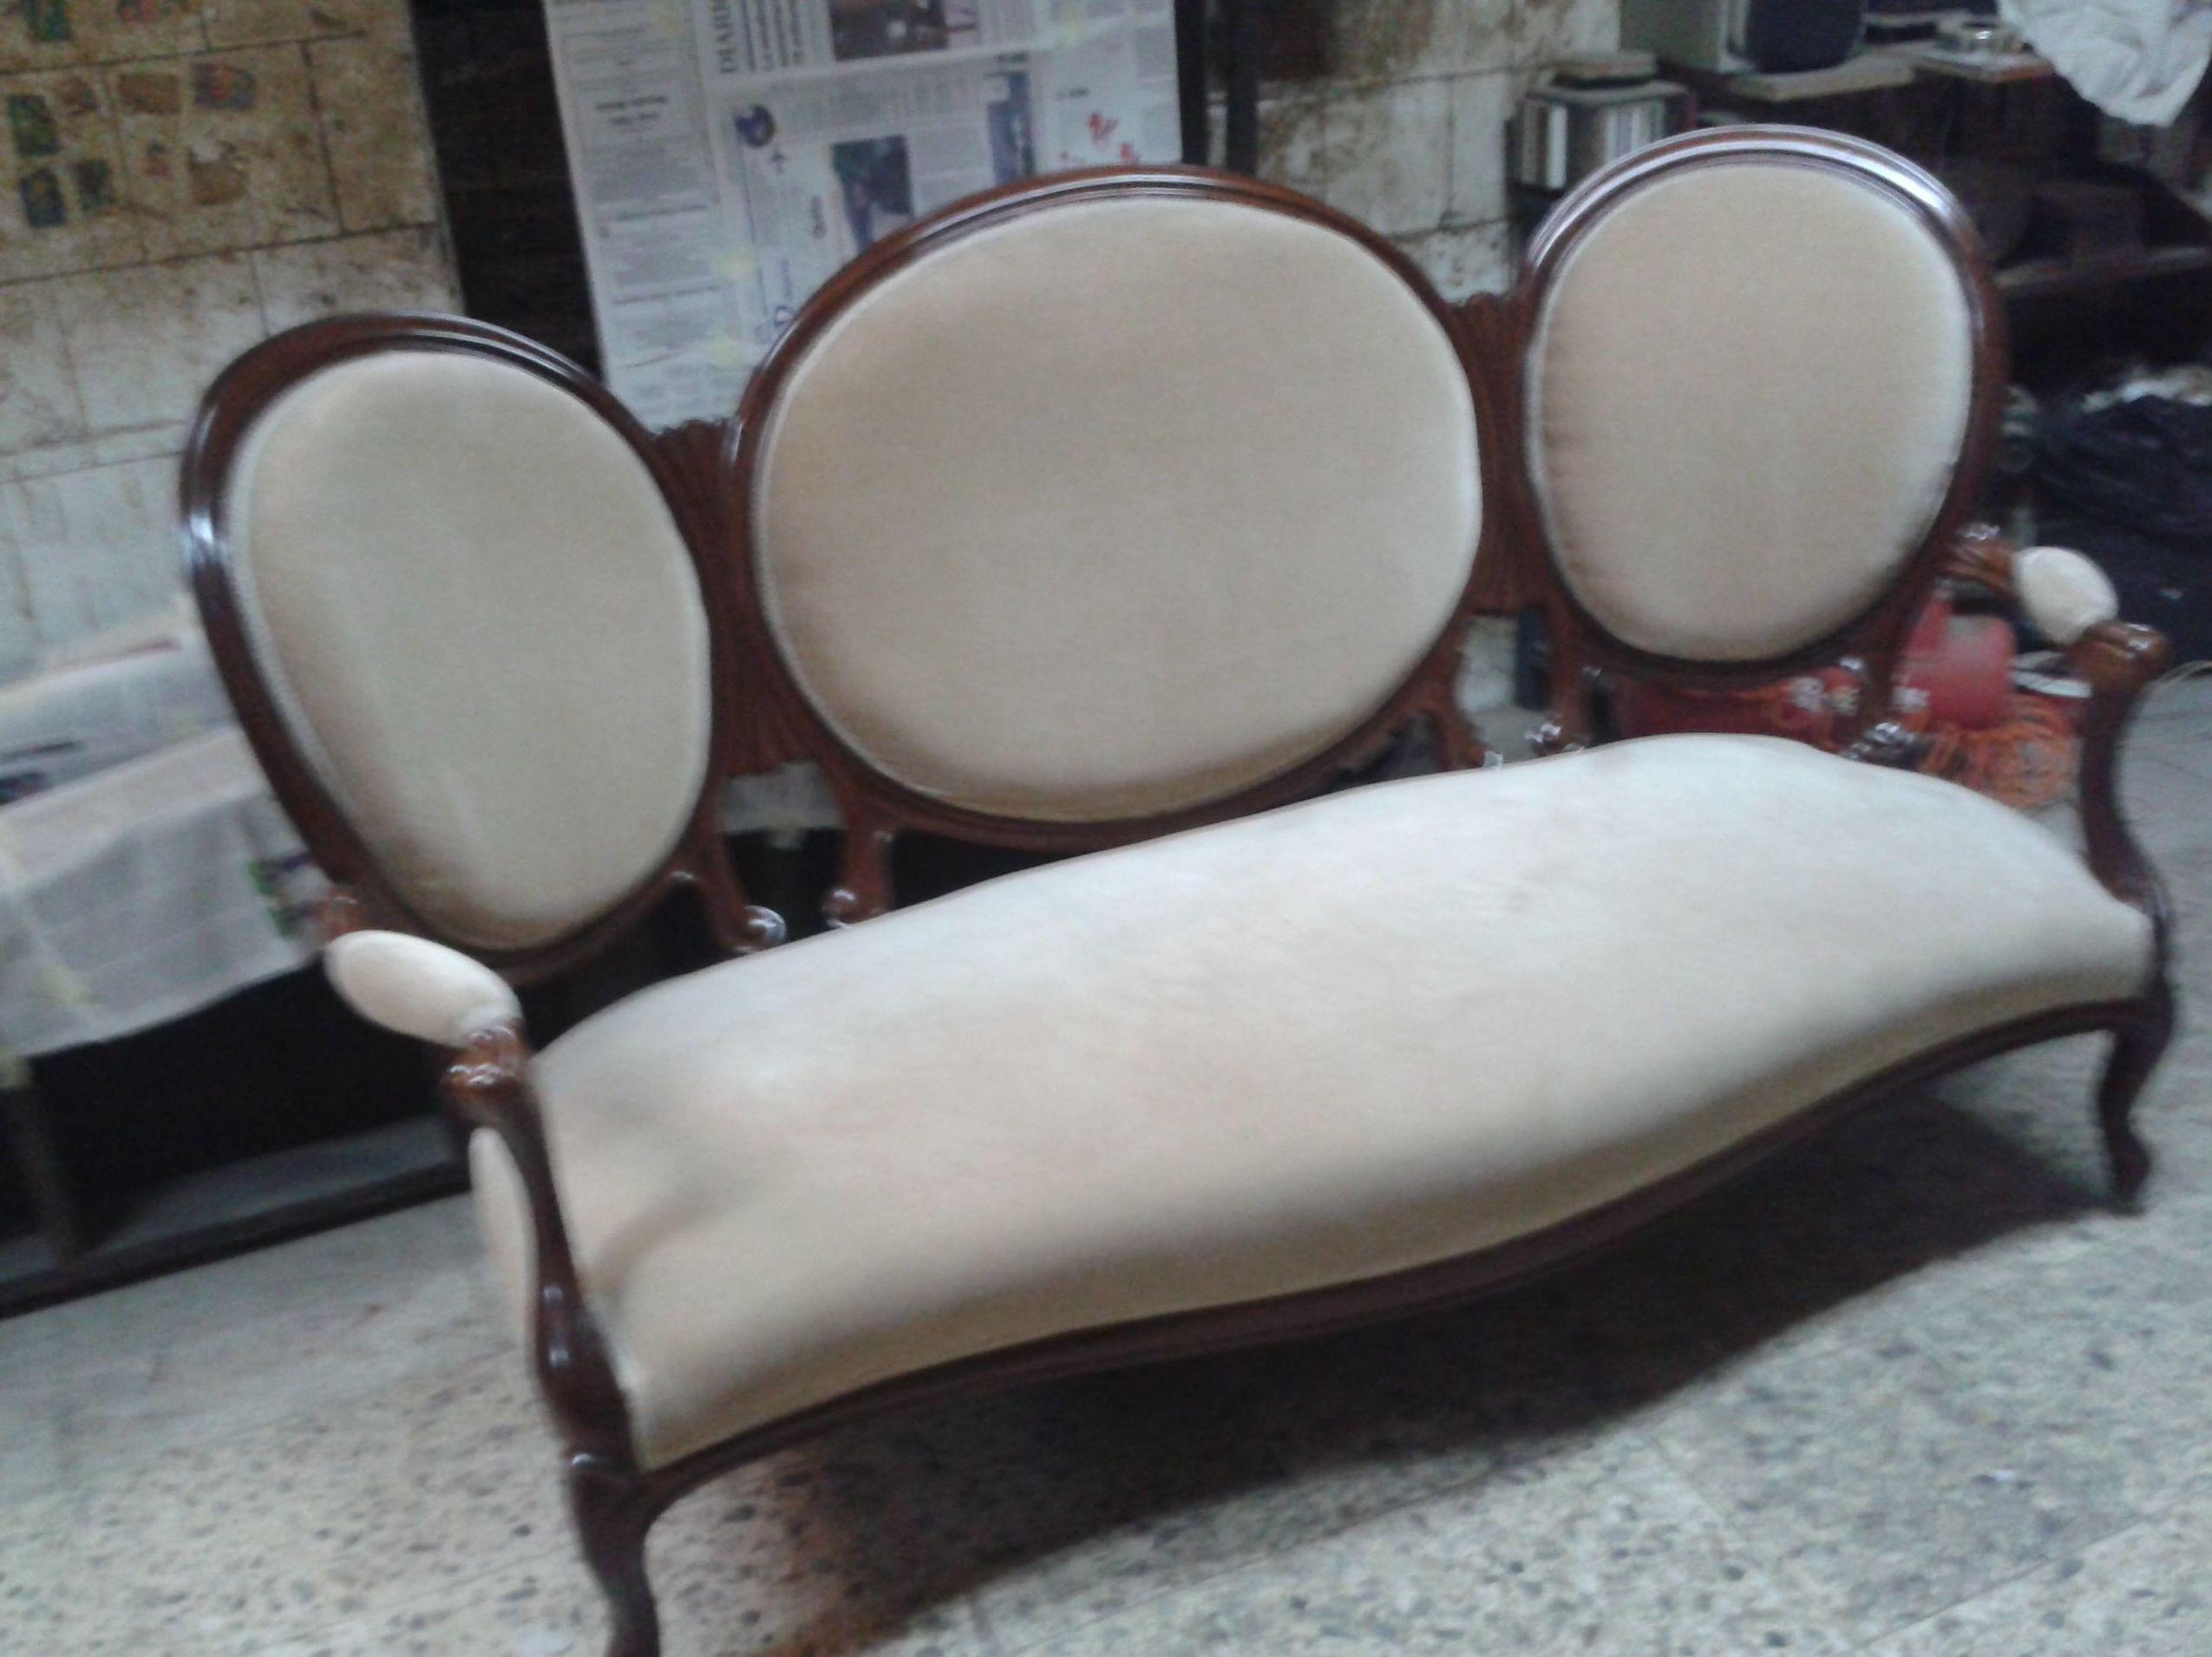 Foto 39 de Restauración de muebles en Pamplona | Lendik Restauración